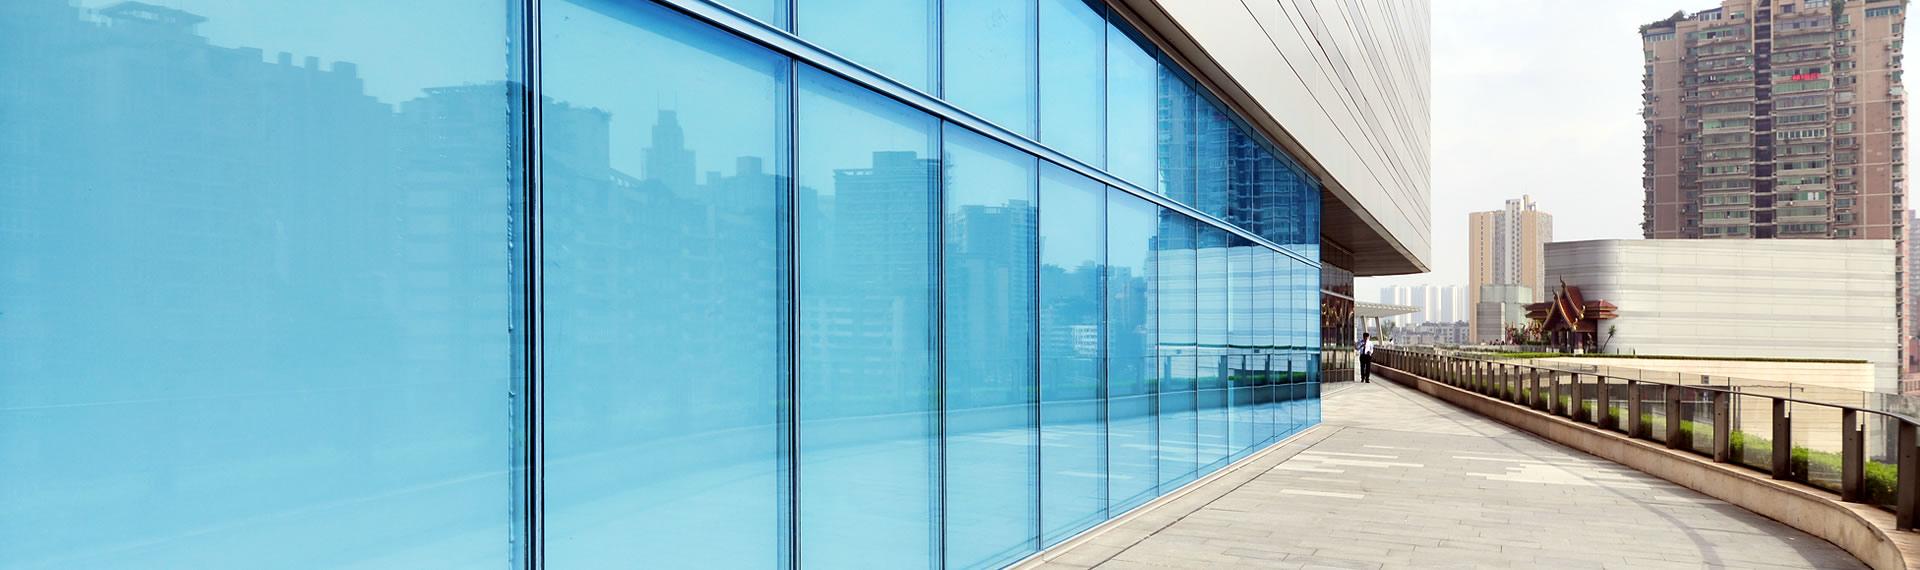 seguridad arquitectonica